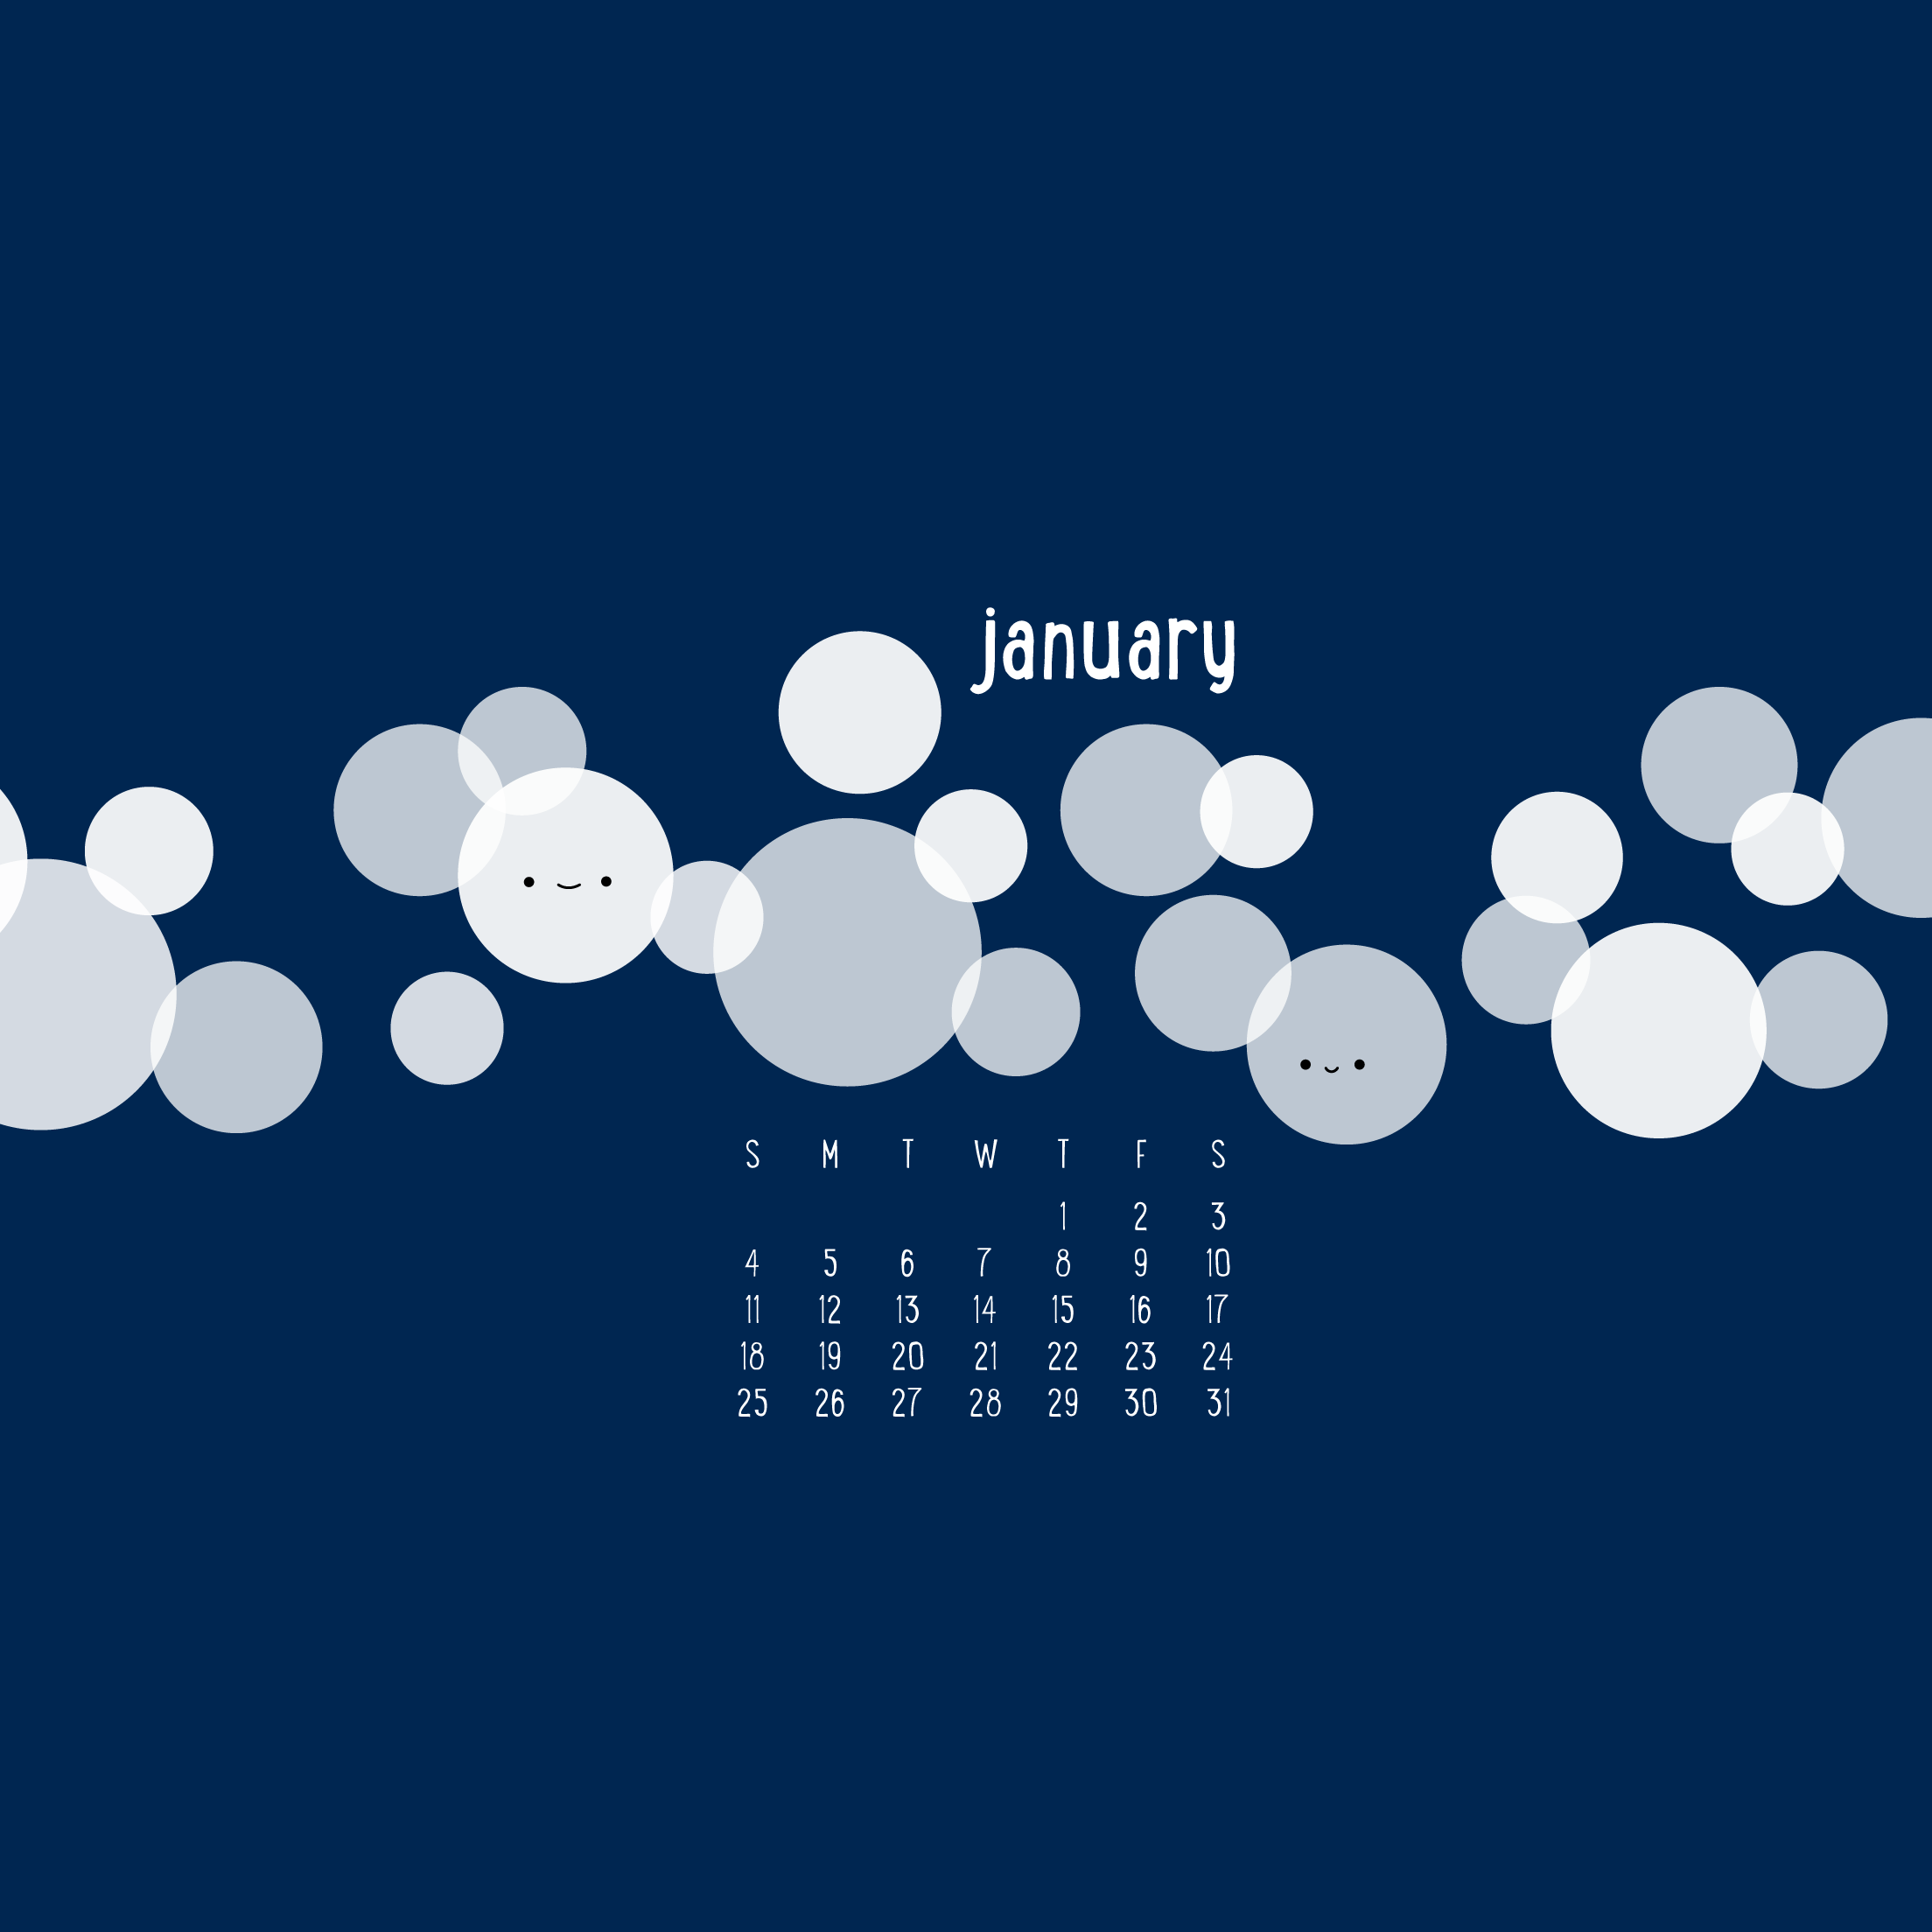 Wild Olive calendar circling january 2208x2208